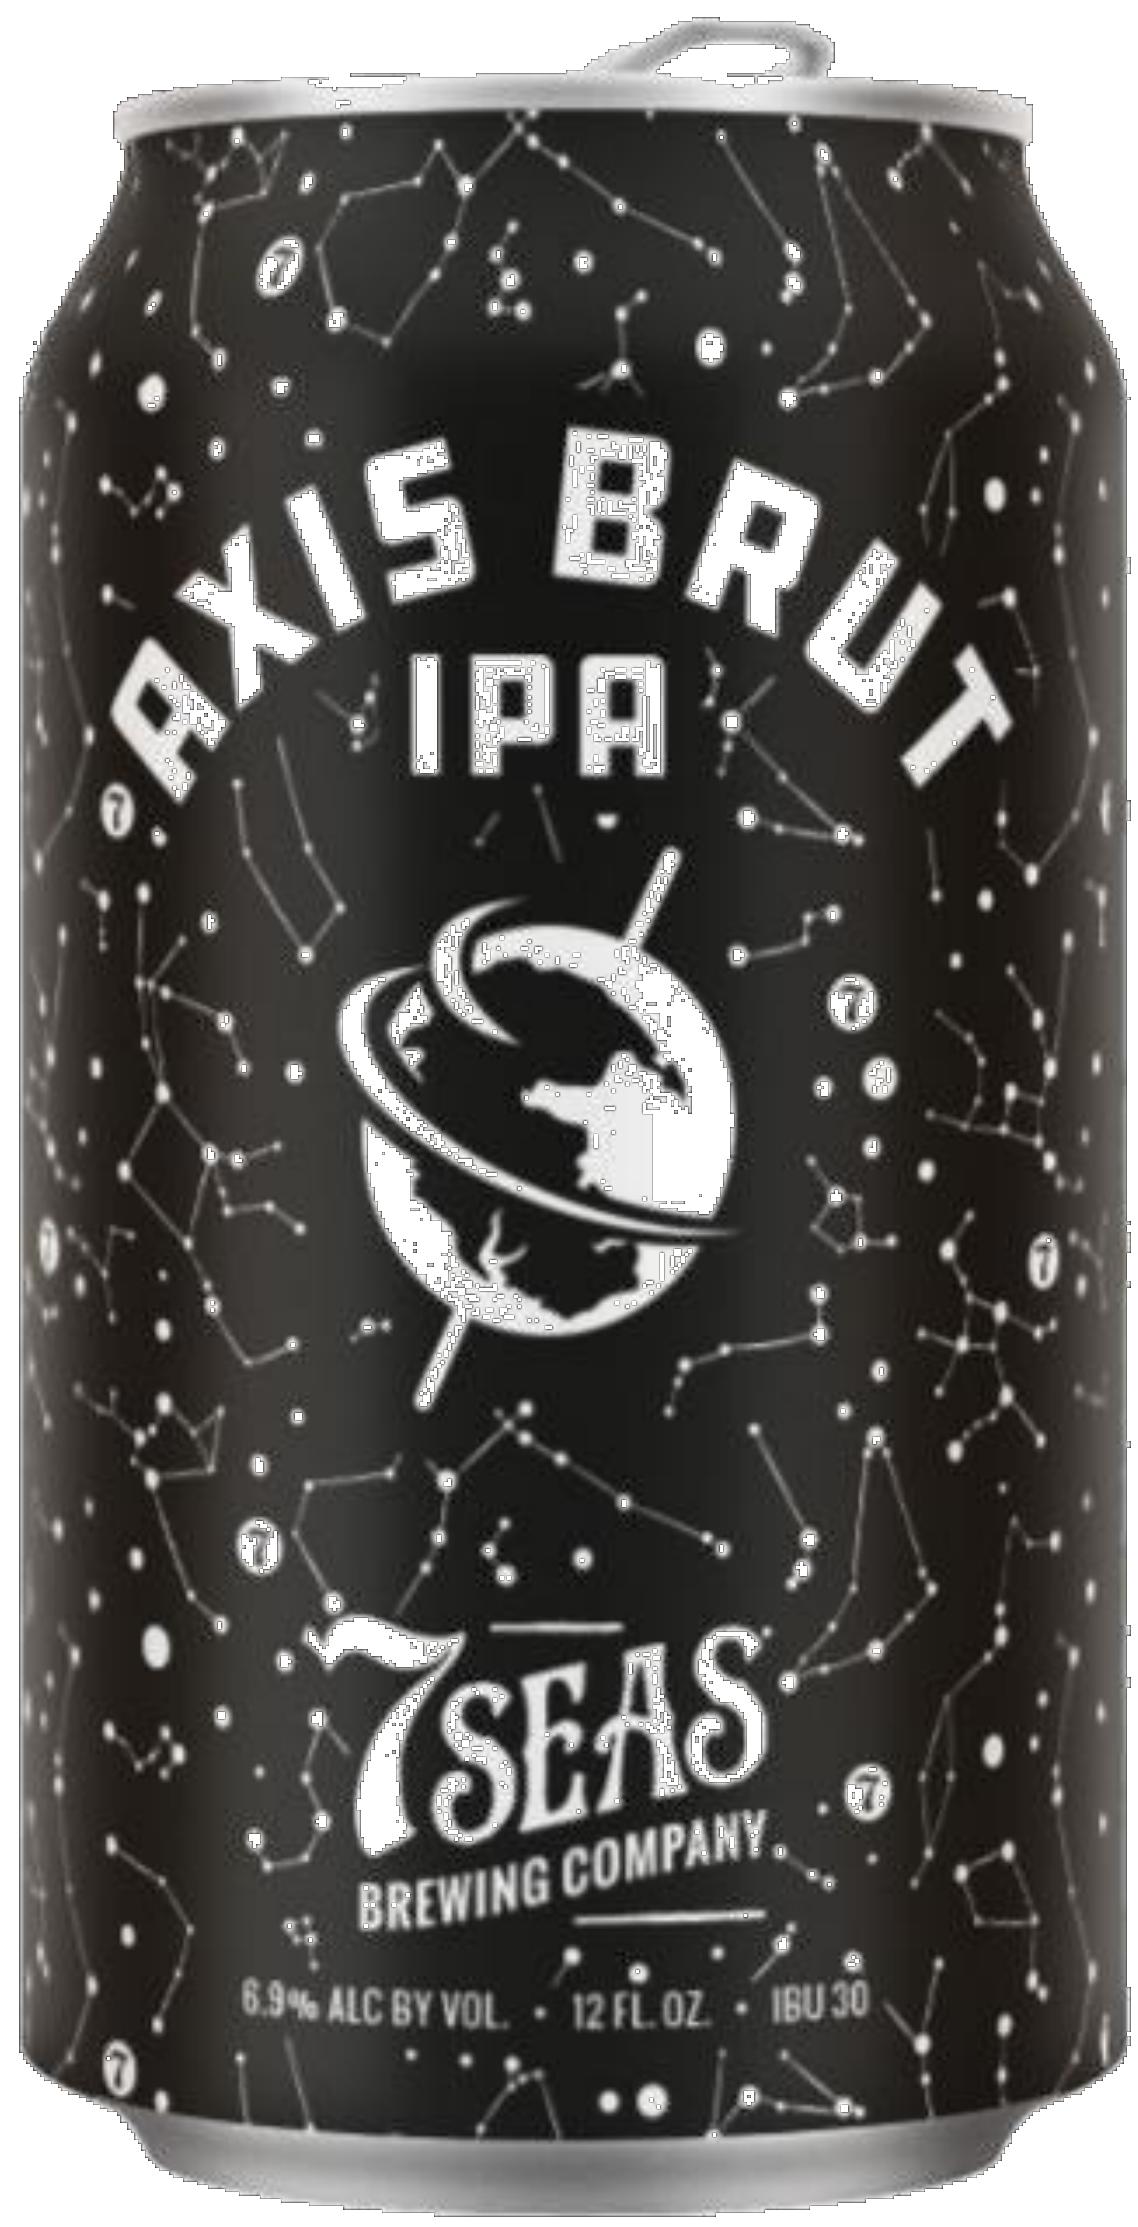 image courtesy 7 Seas Brewing Company